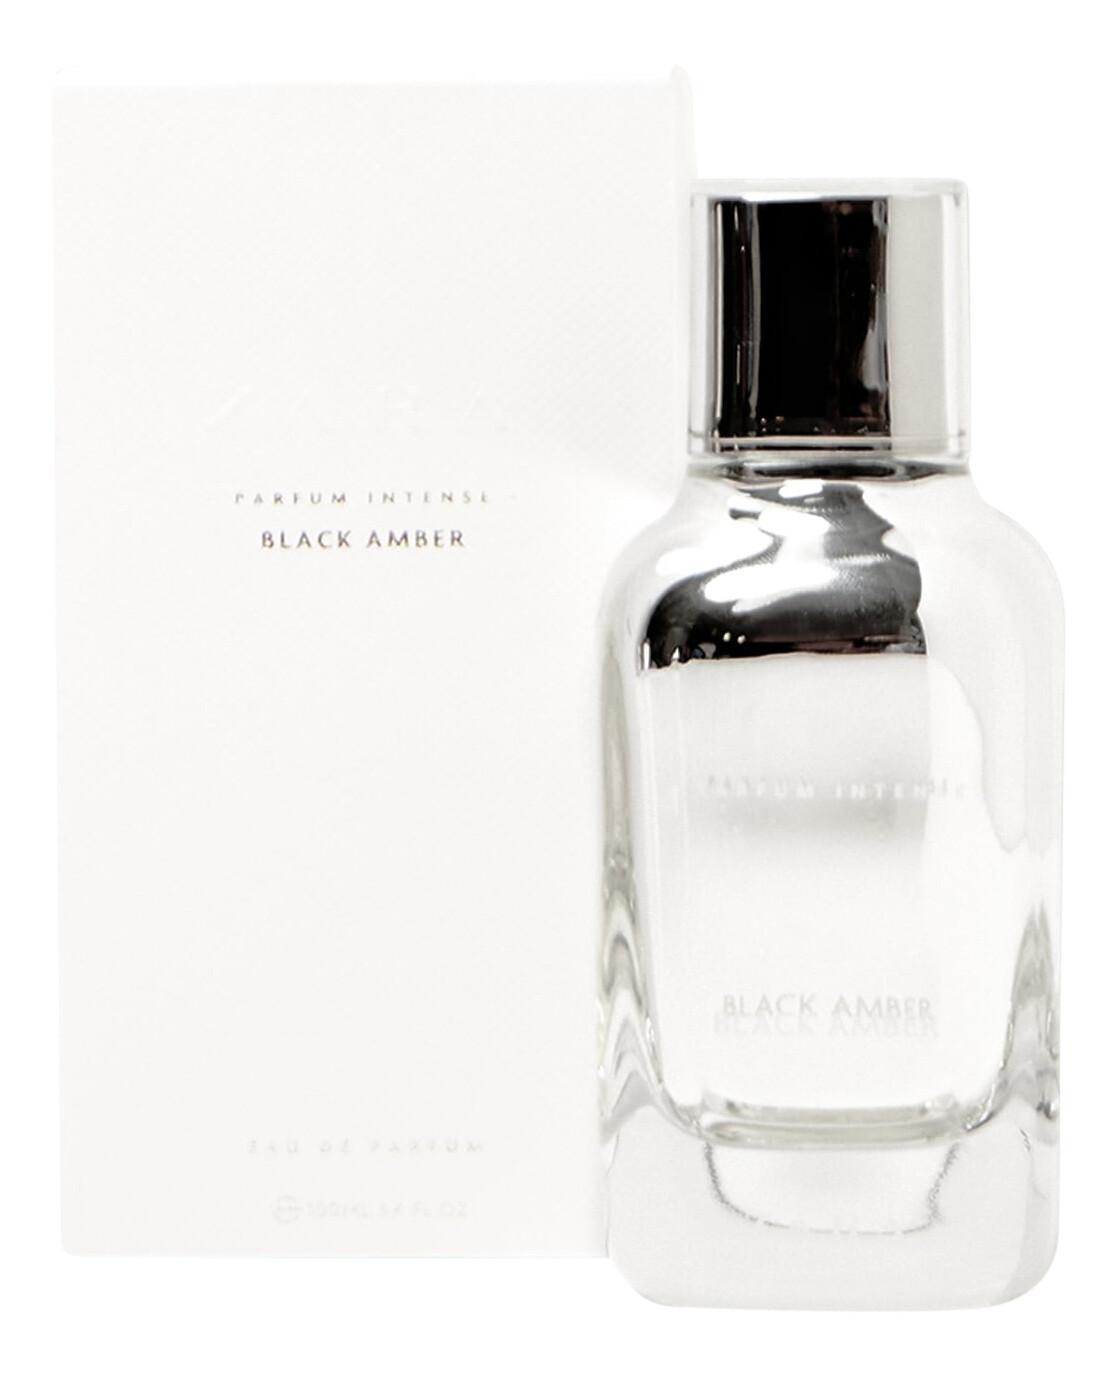 Zara Black Amber Parfum Intense